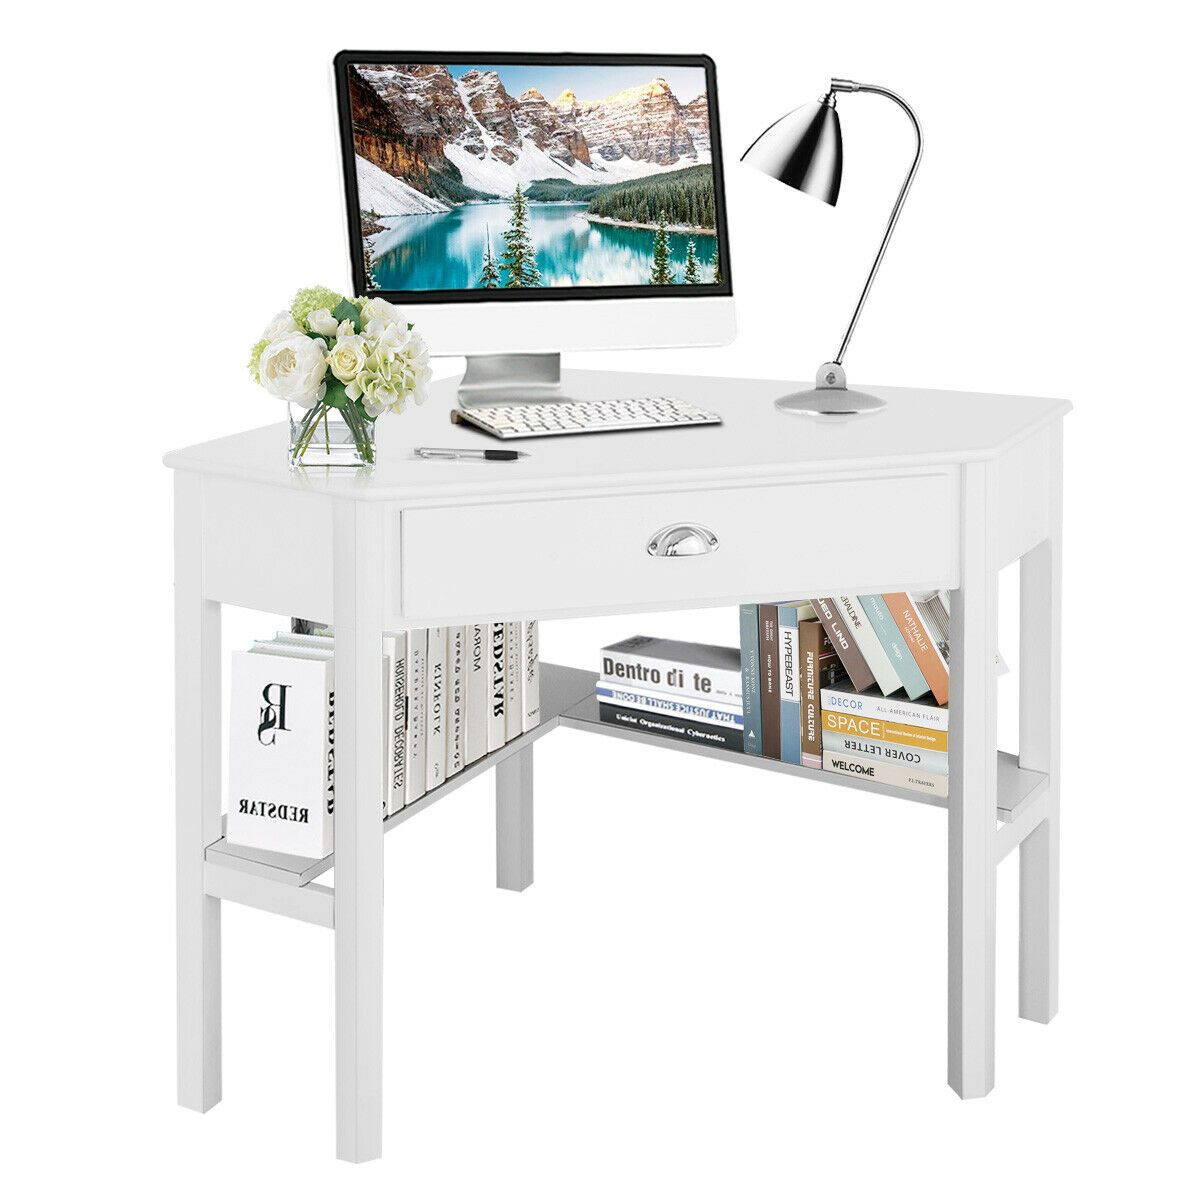 Free 31-day shipping. Buy Costway Corner Computer Desk Laptop